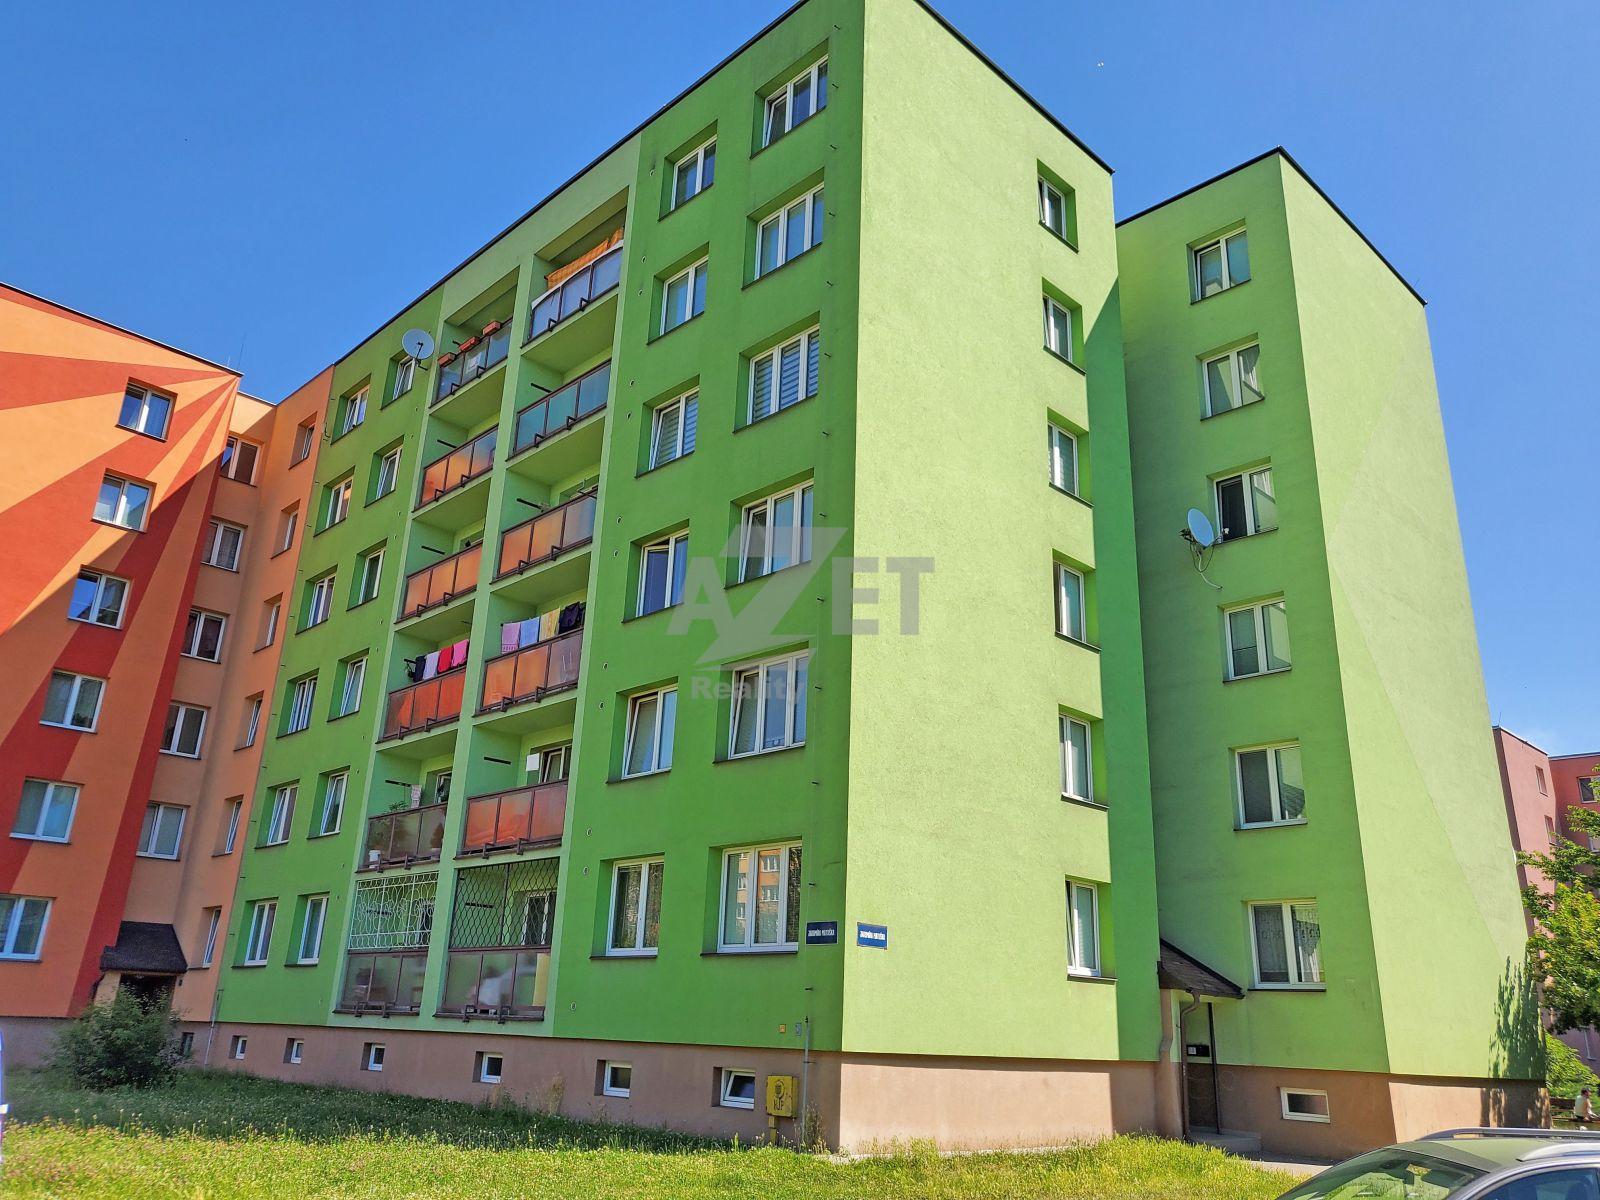 Prodej, byt 3+1, 68 m2, Ostrava - Dubina , ul. J. Matuška